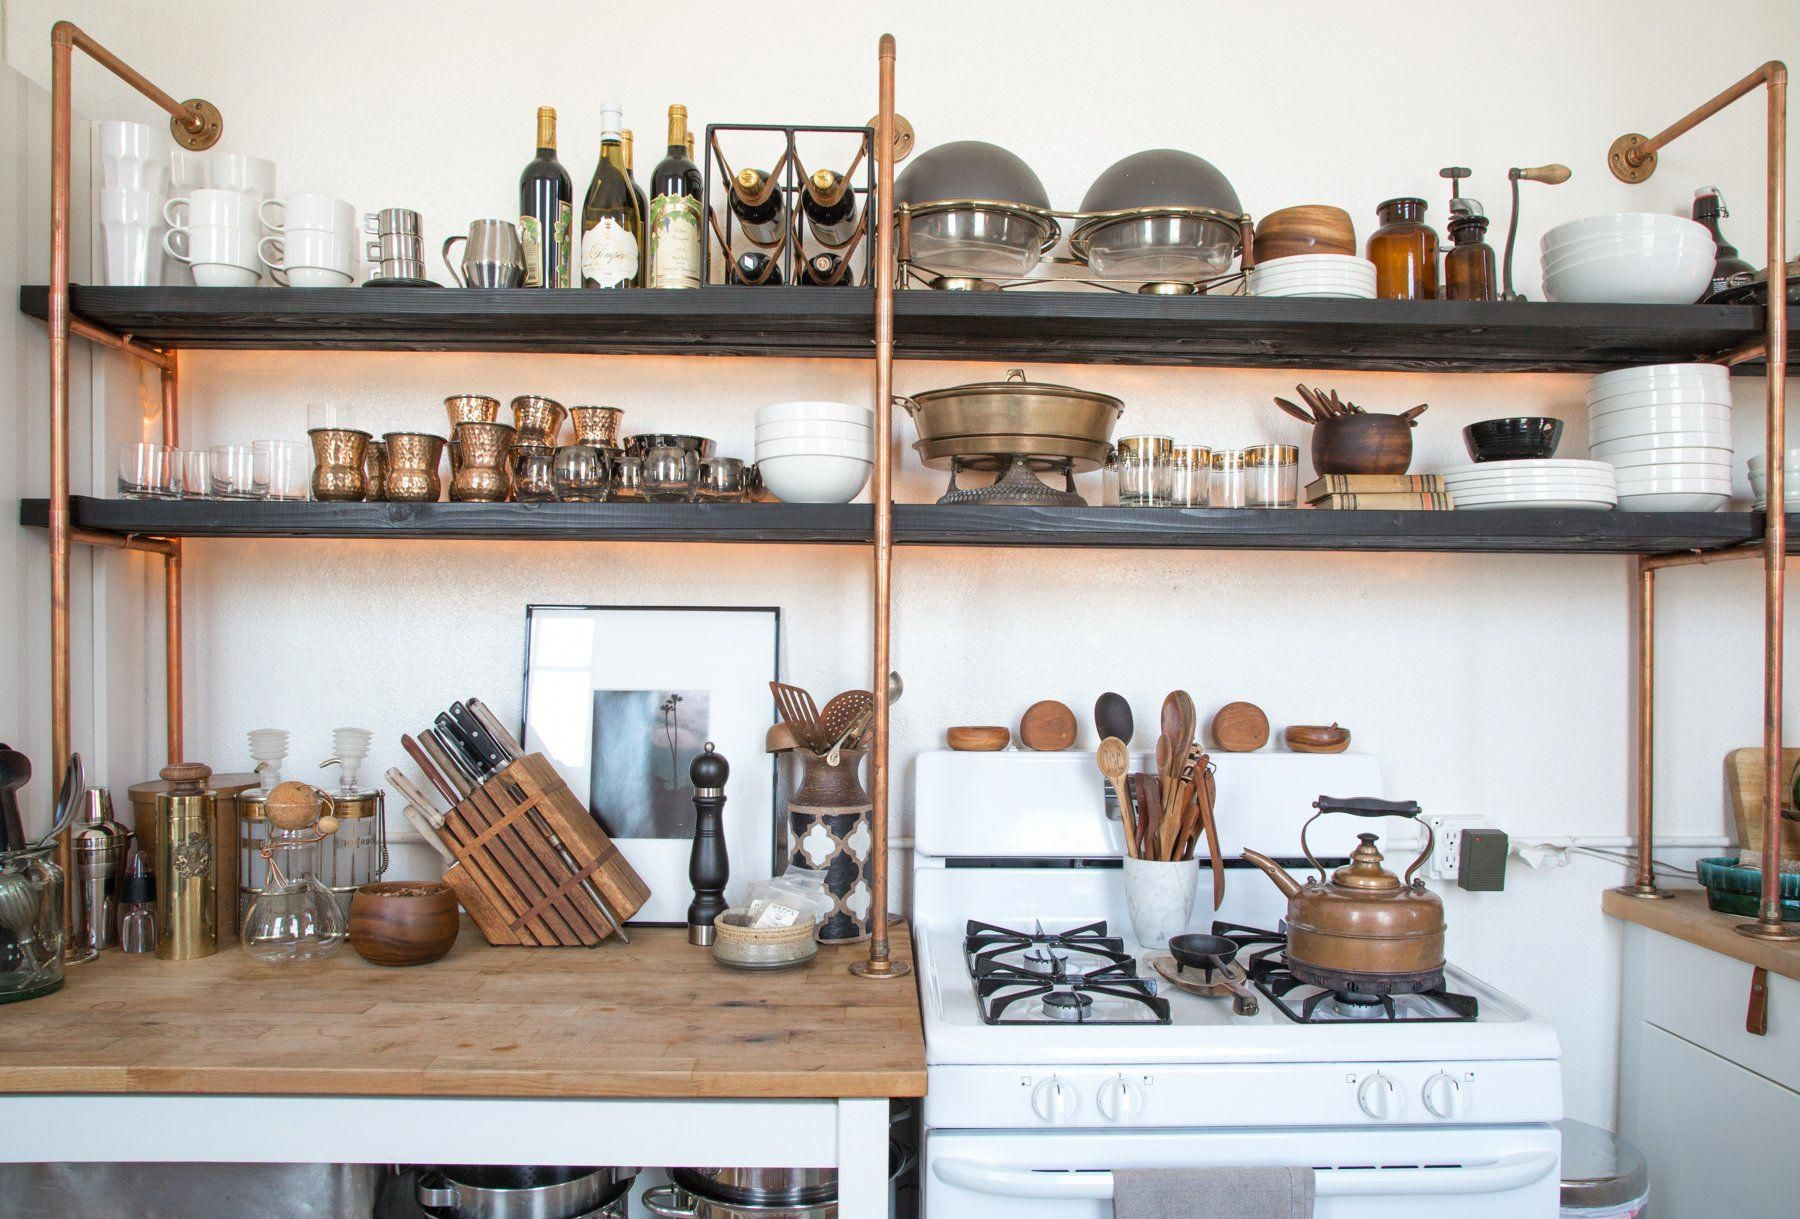 copper-pipes-1 80+ Unusual Kitchen Design Ideas for Small Spaces in 2021